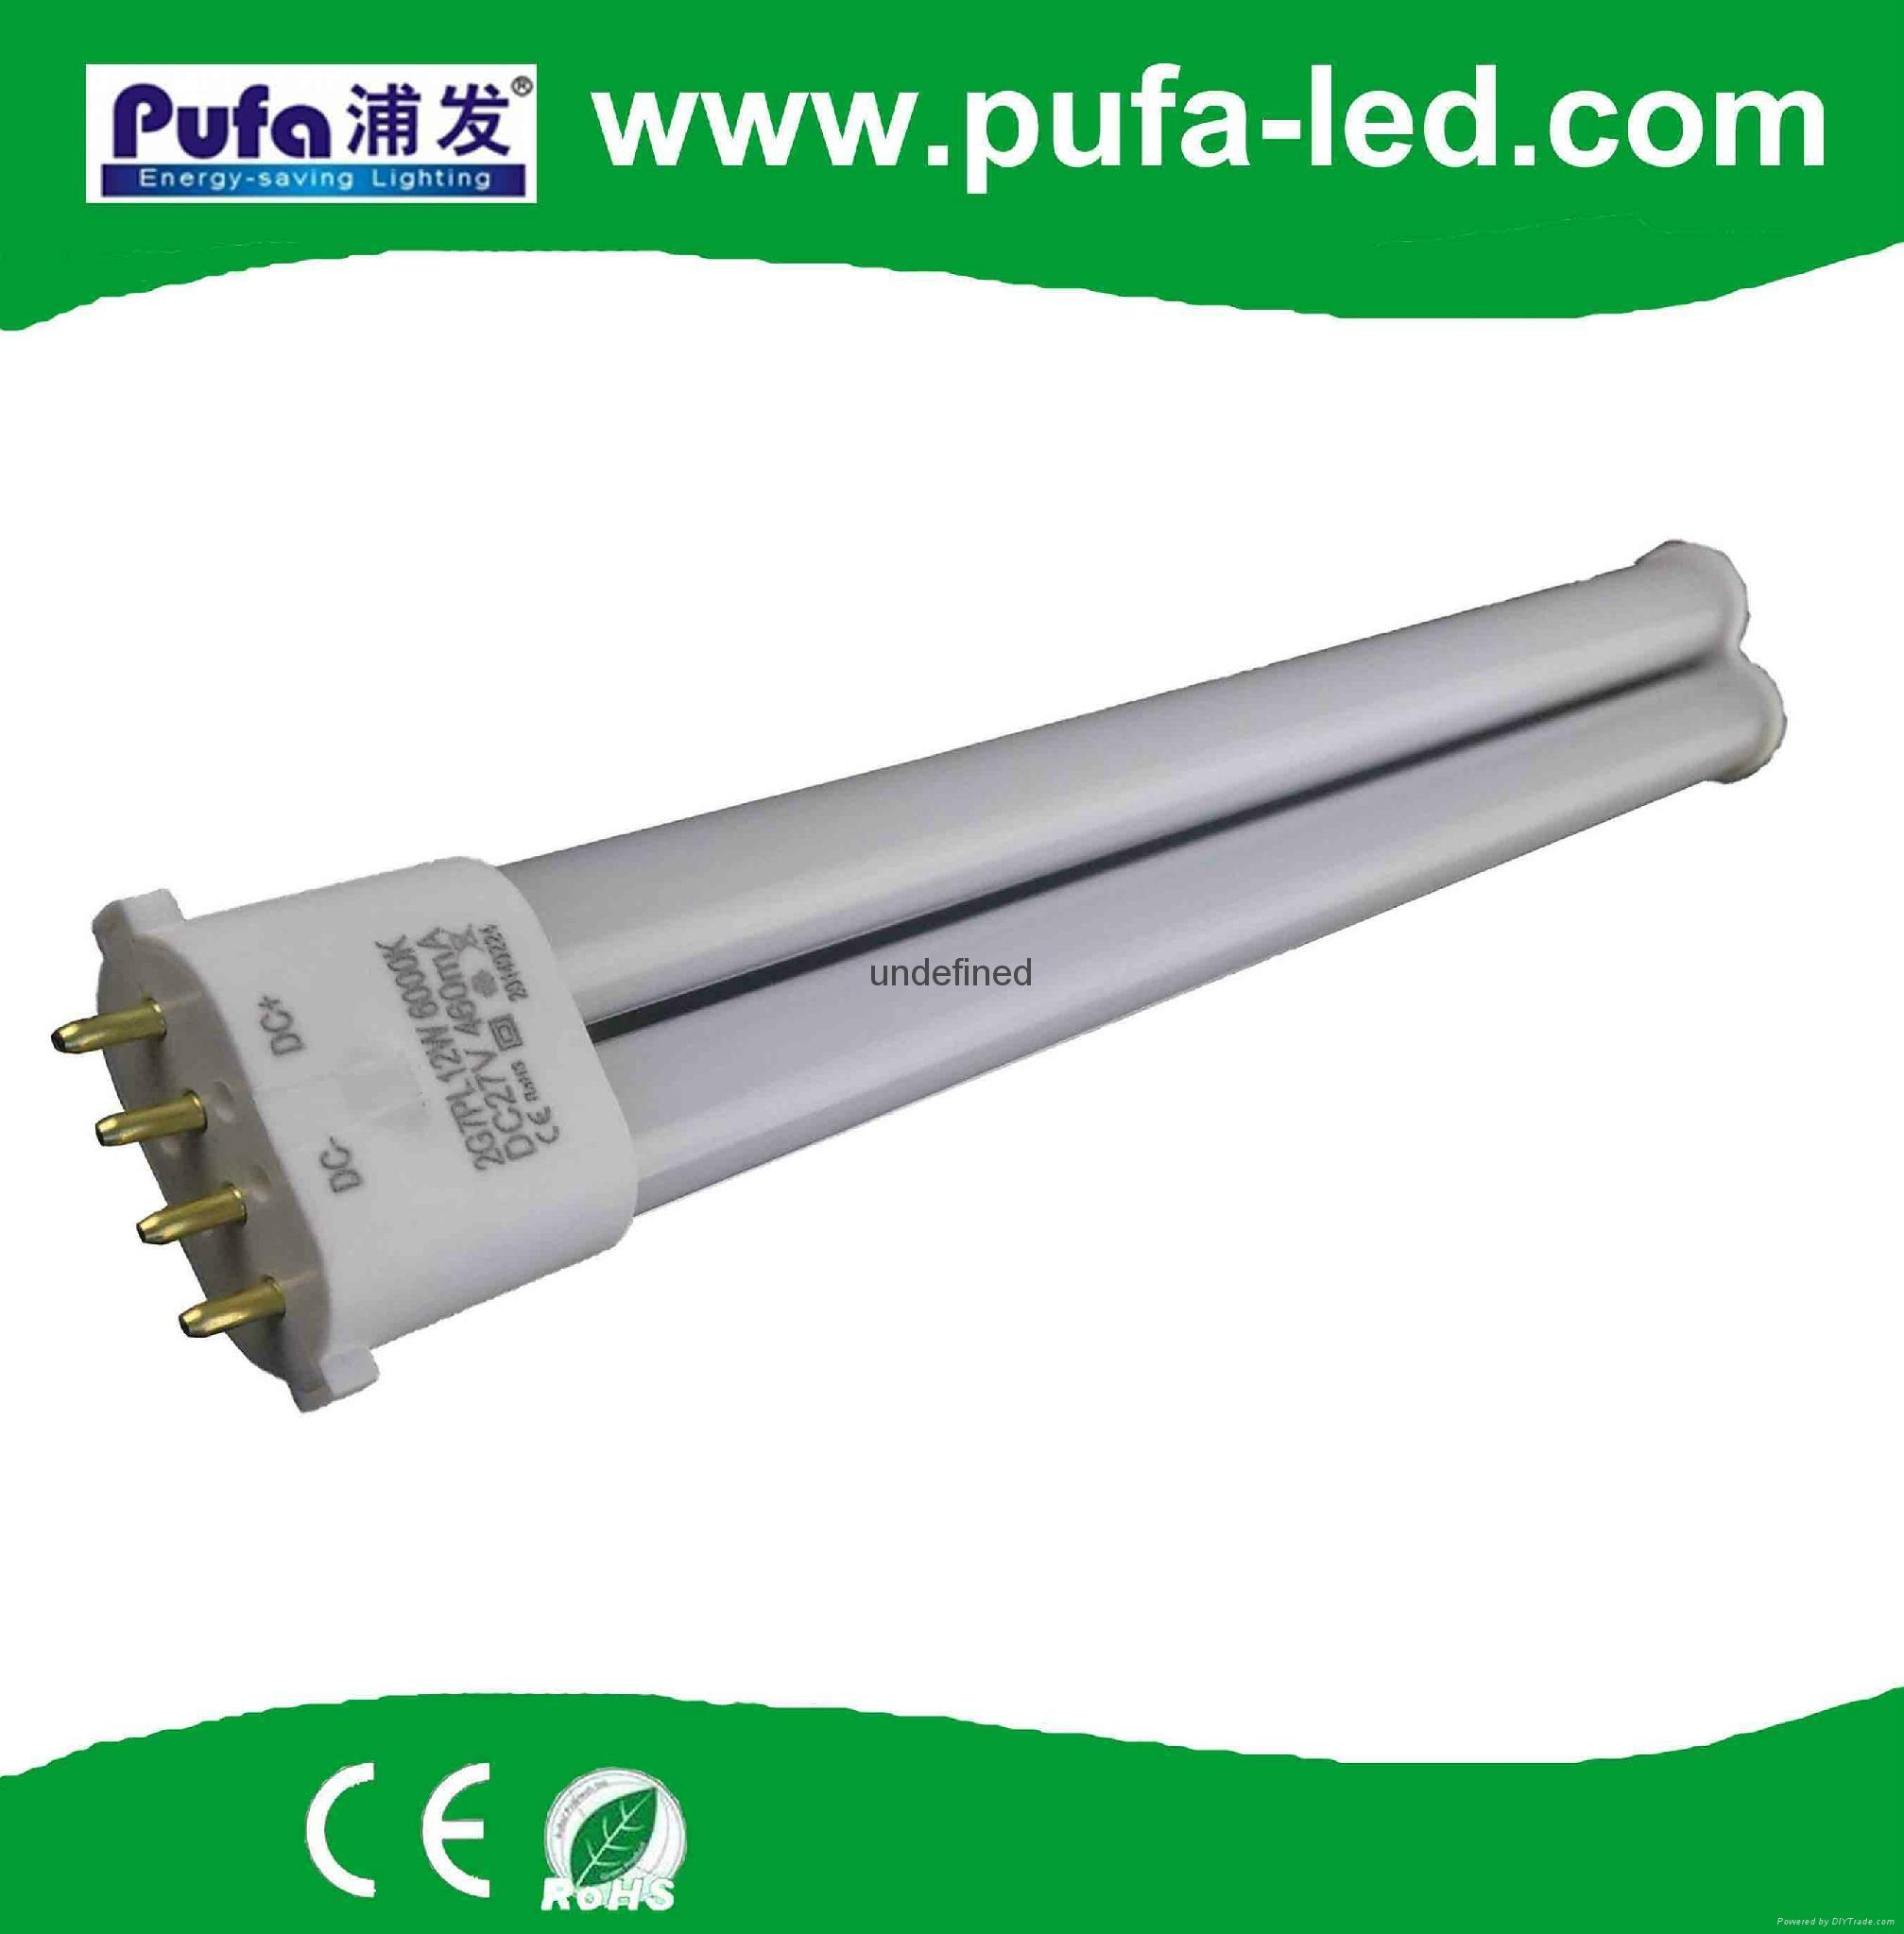 2G7 LED 橫插燈 5W 外置電源 1